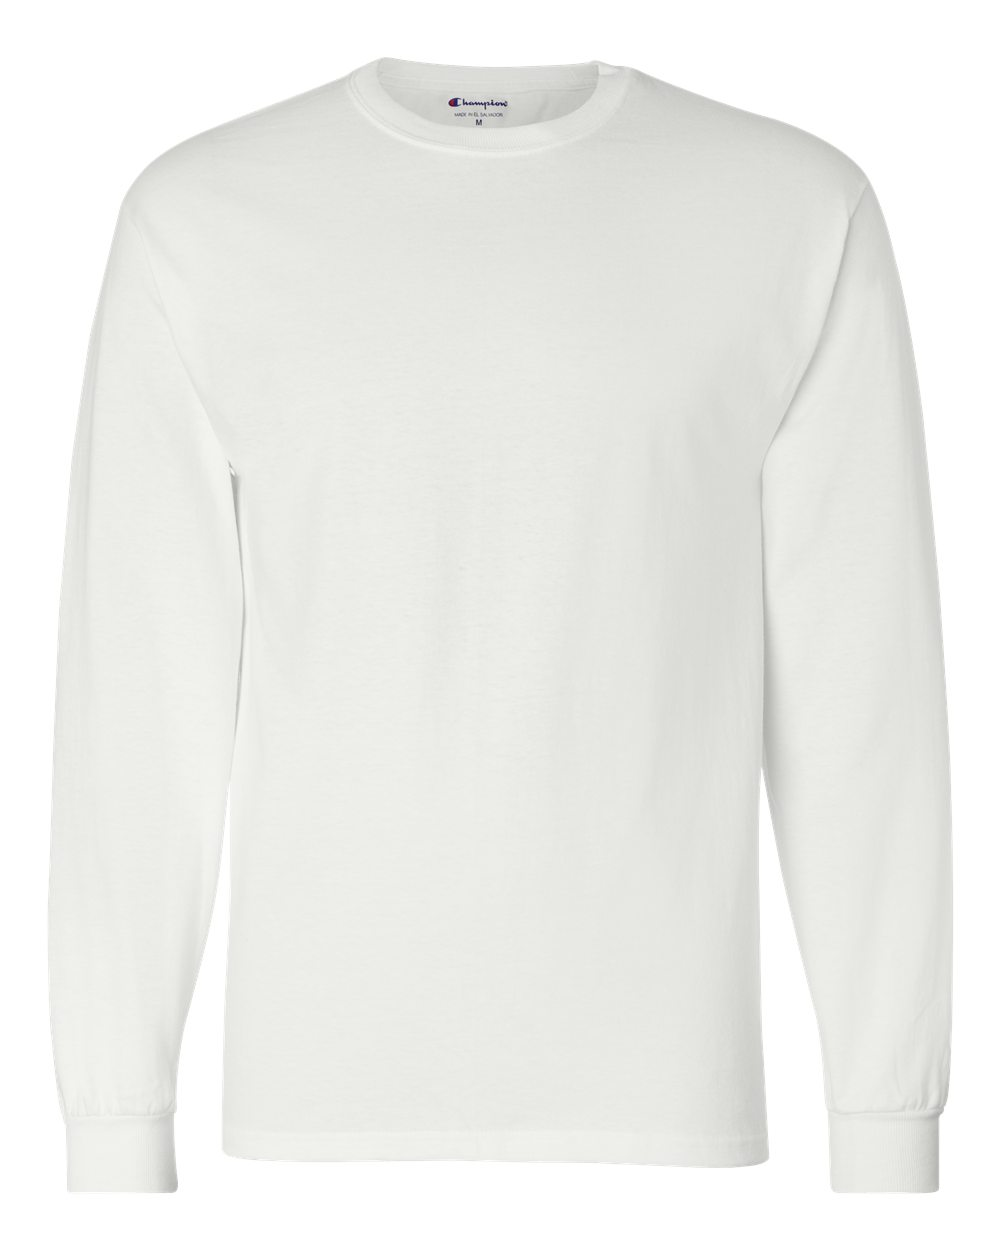 b2c4f62433dd Opentip.com: Champion CC8C Long Sleeve Tagless T-Shirt, Price/each